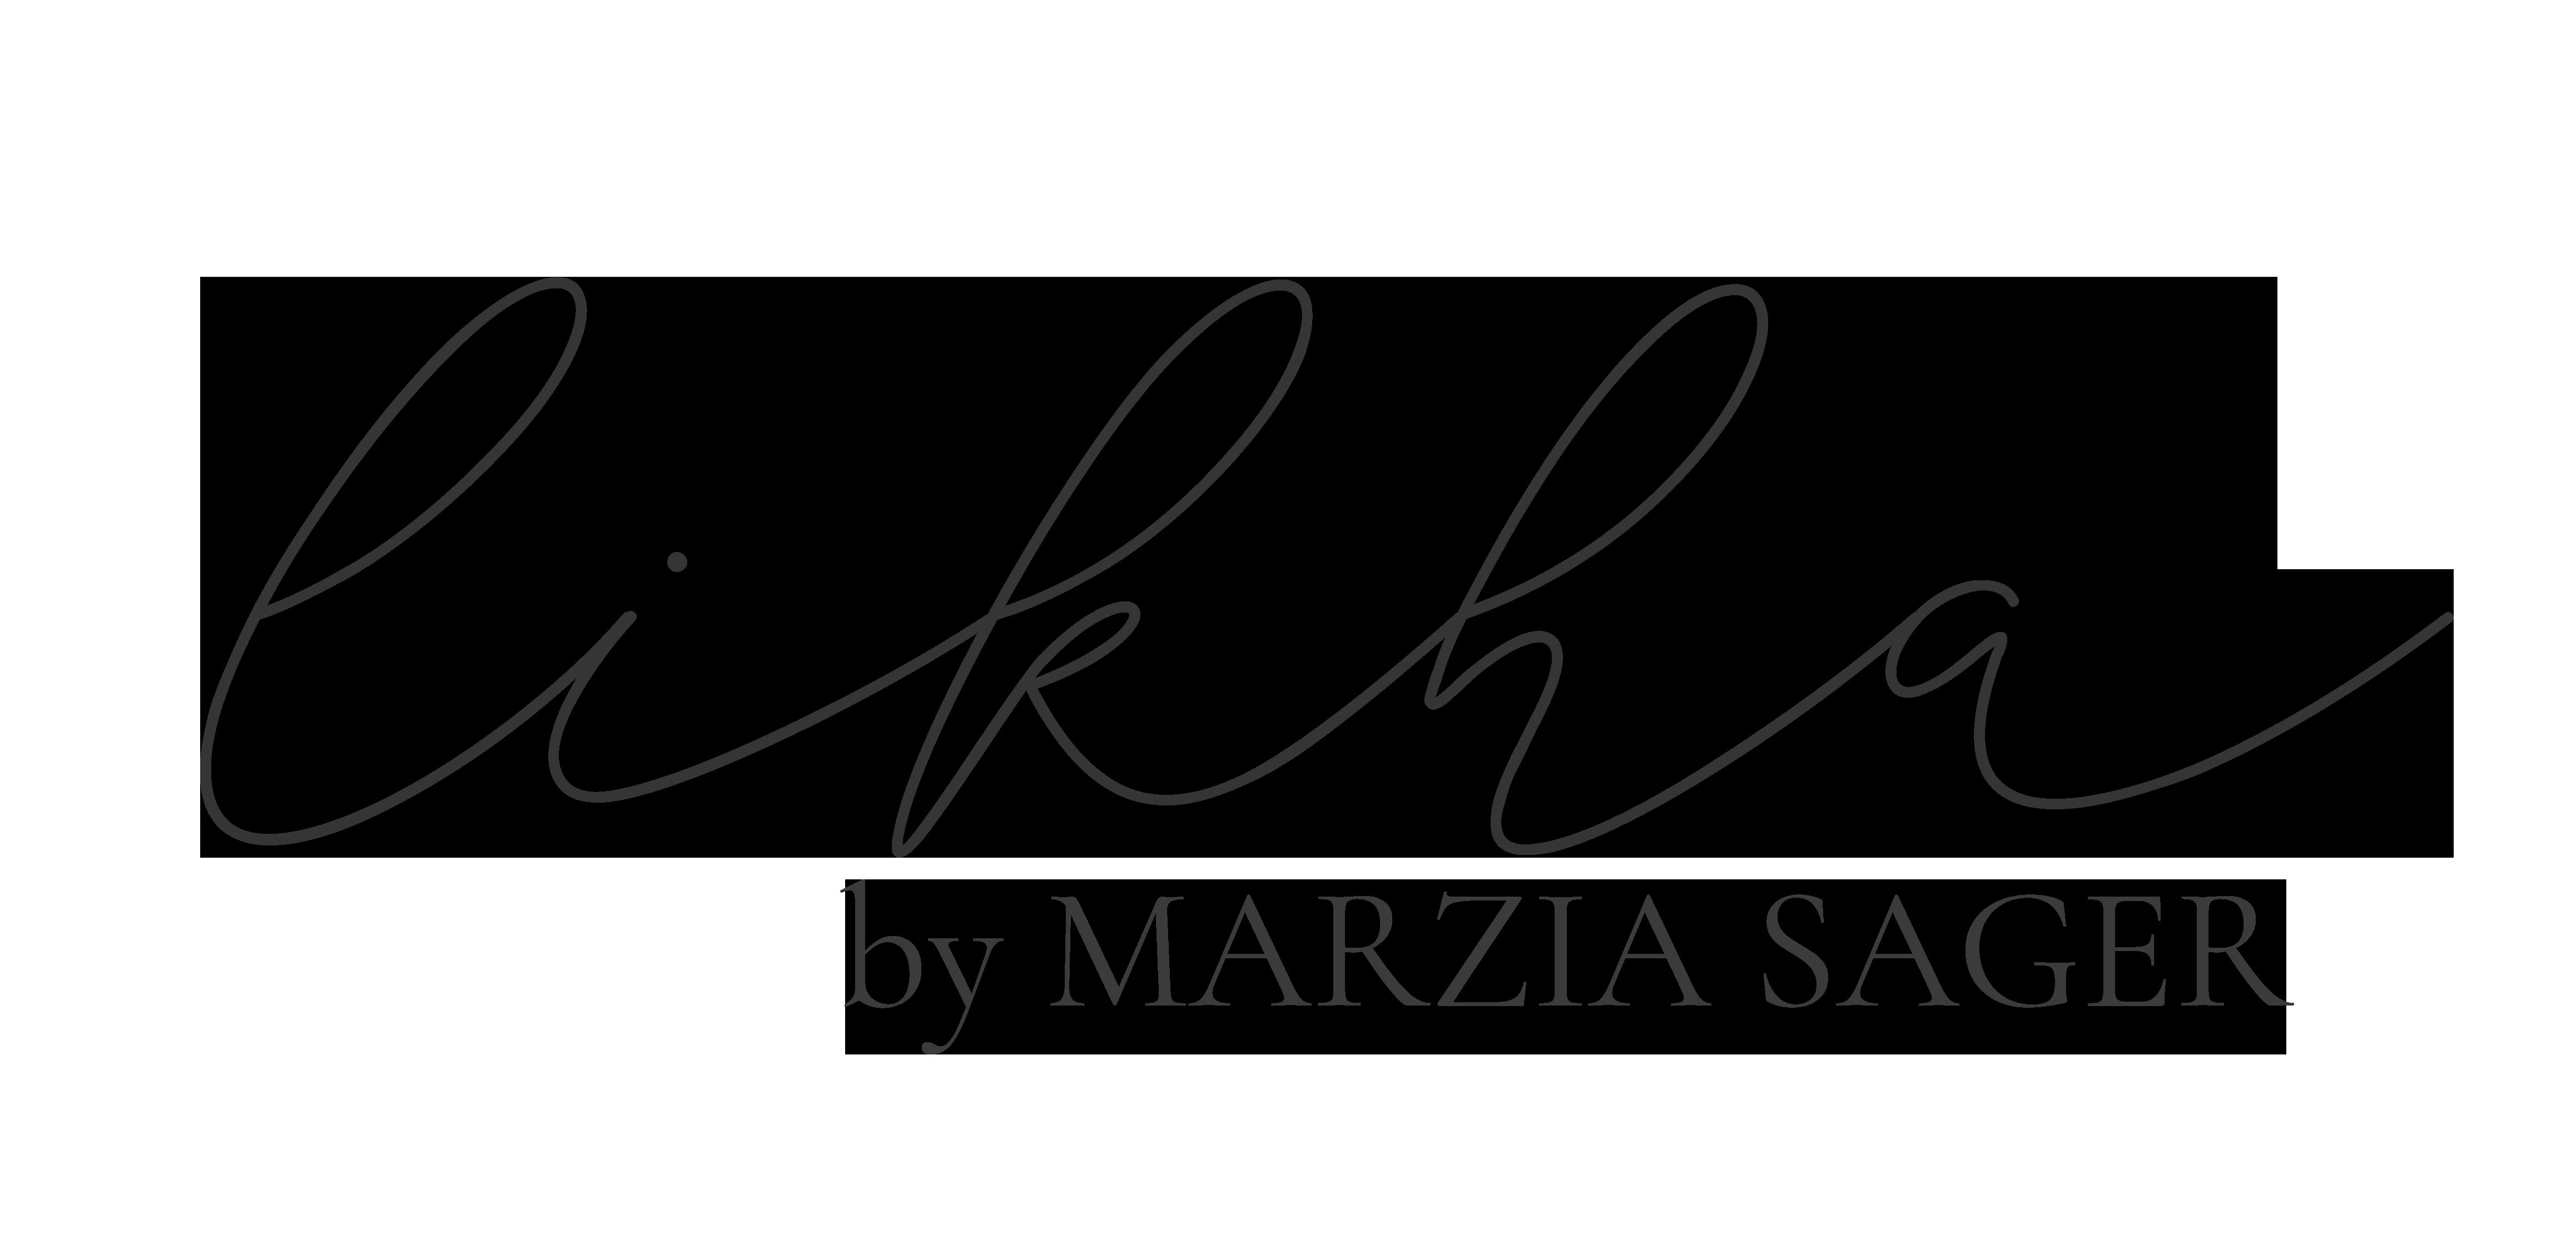 Marzia Sager